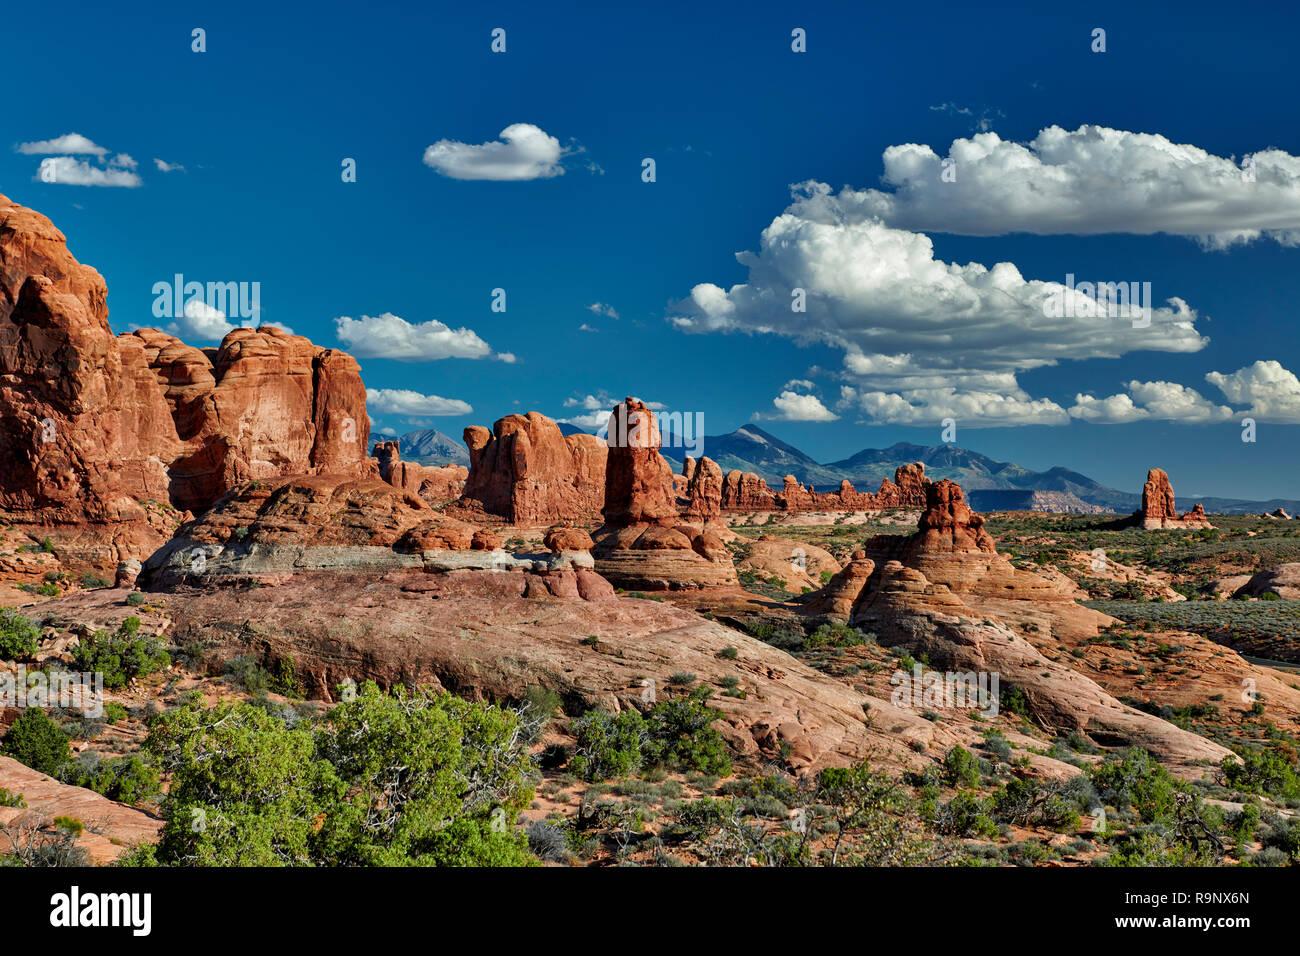 Garden of Eden, Arches National Park, Moab, Utah, USA, North America Stock Photo